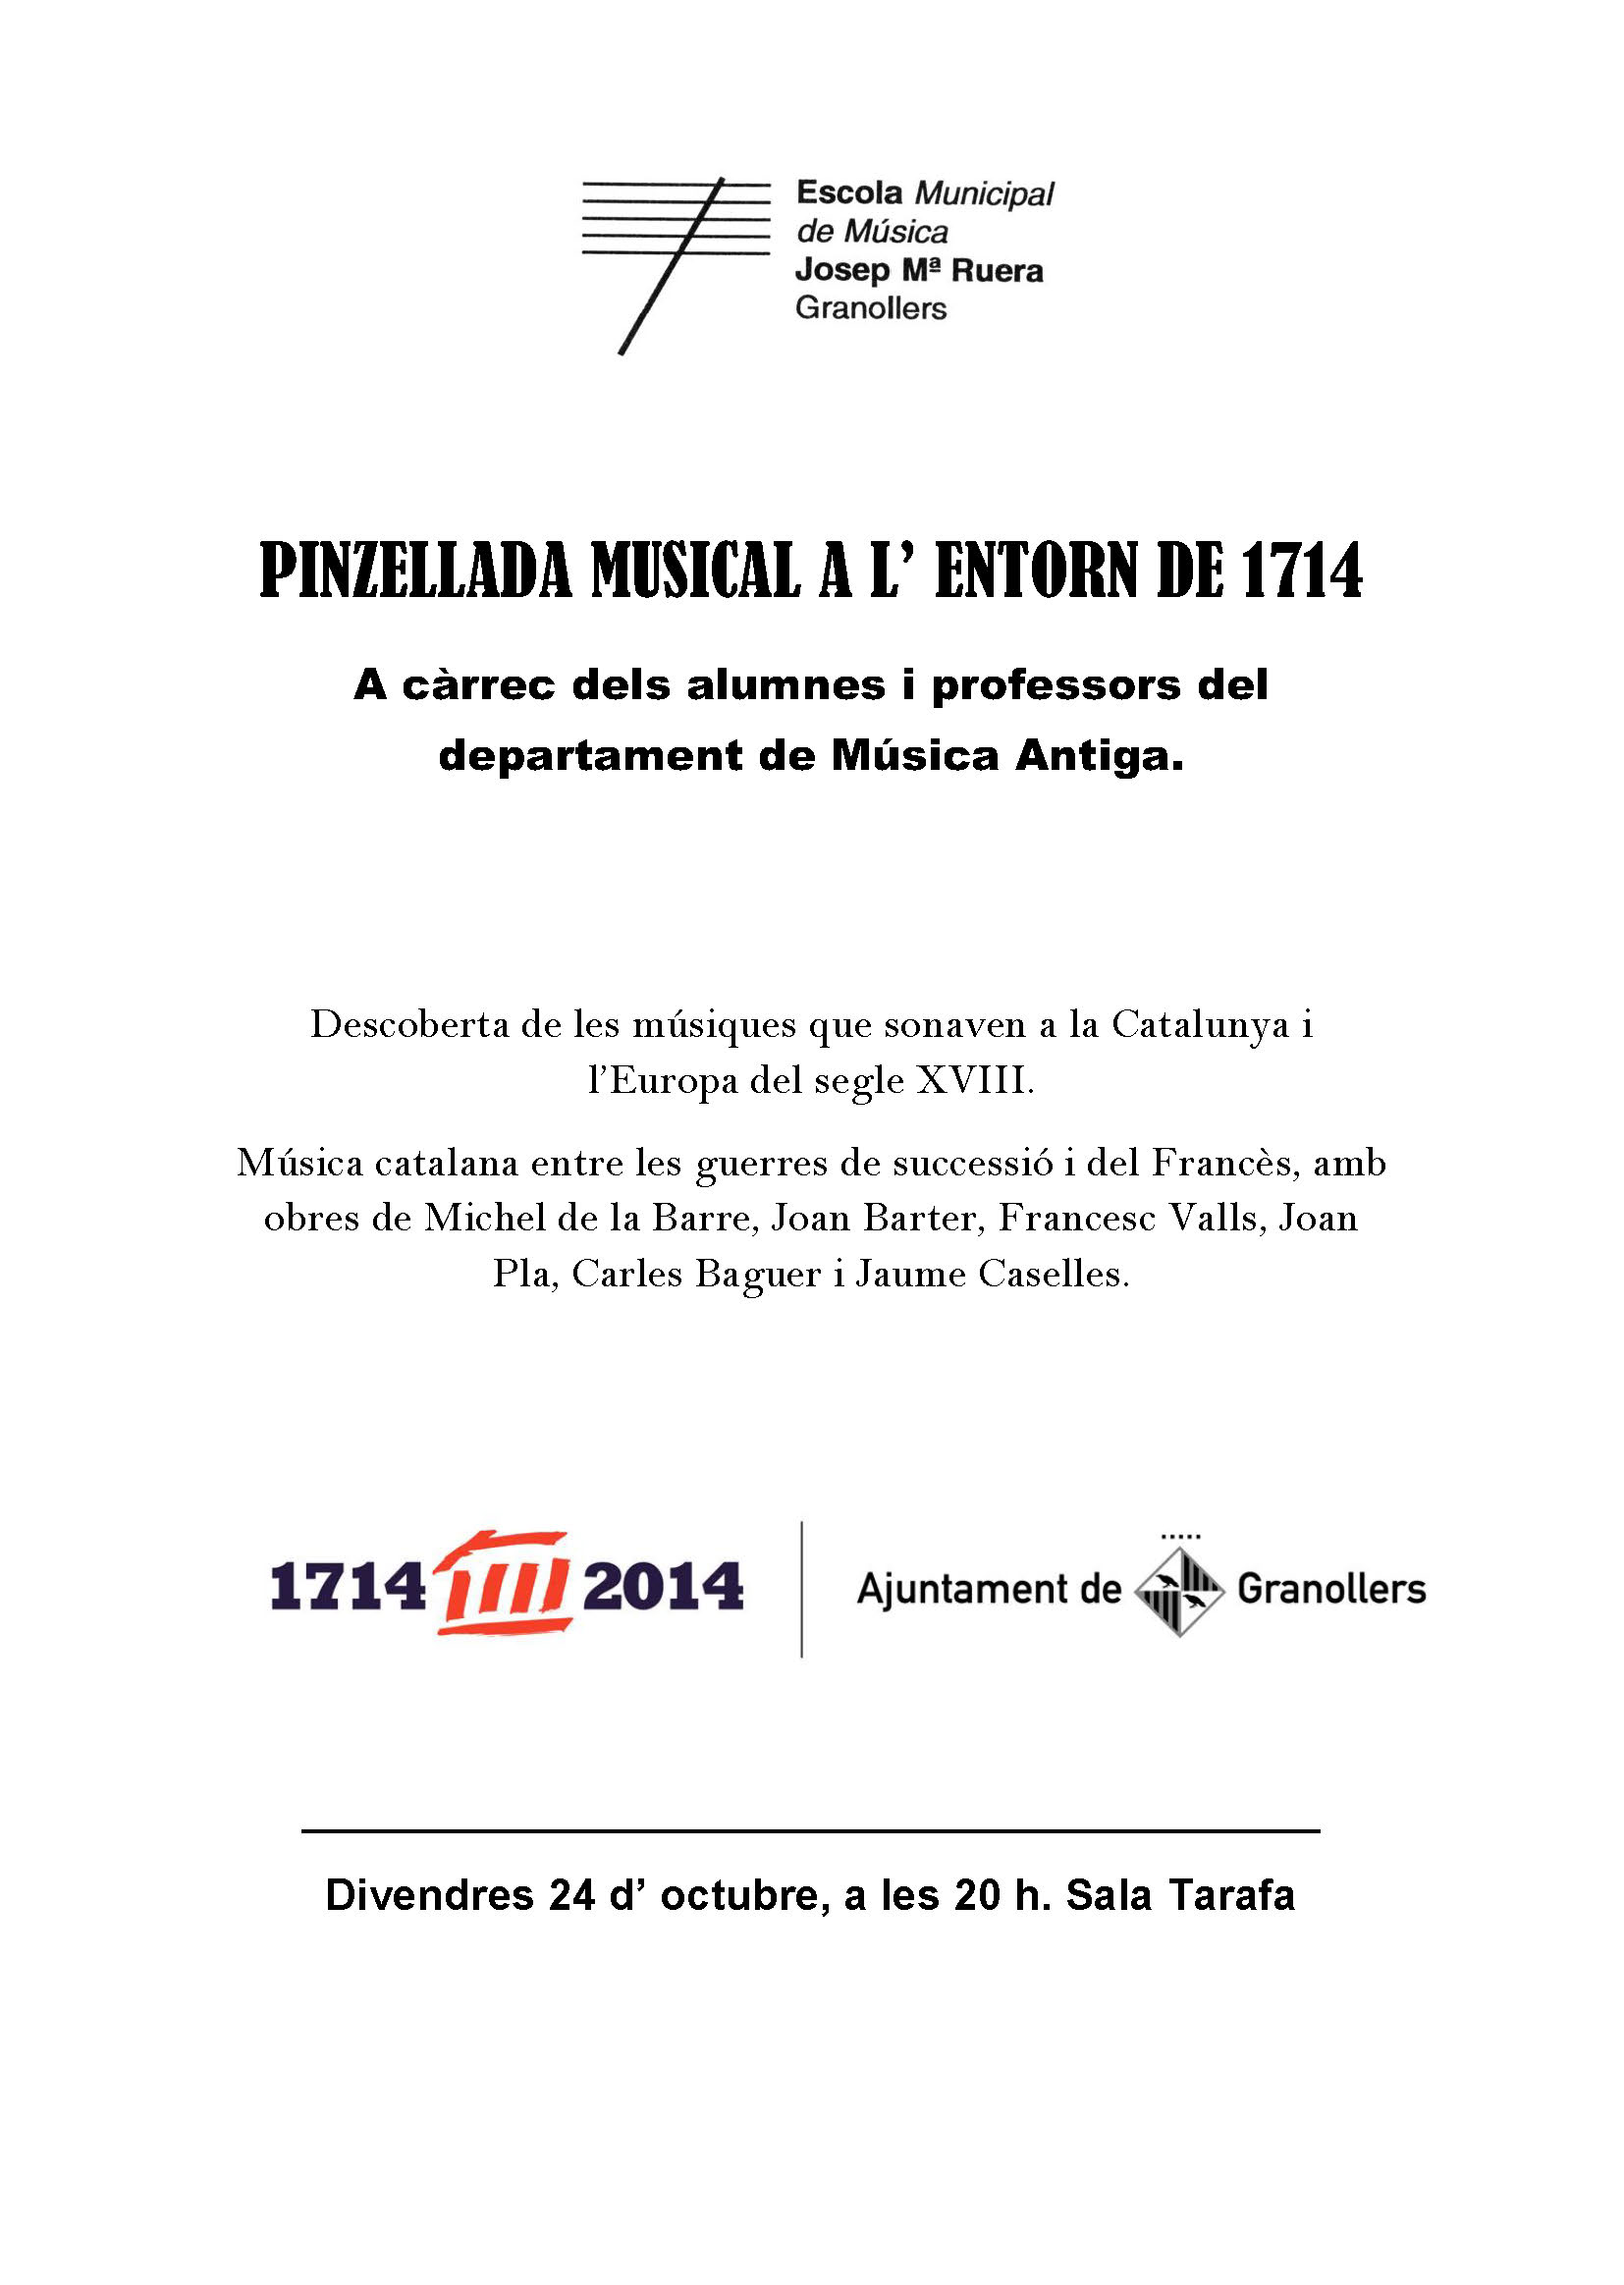 PINZELLADA MUSICAL A L